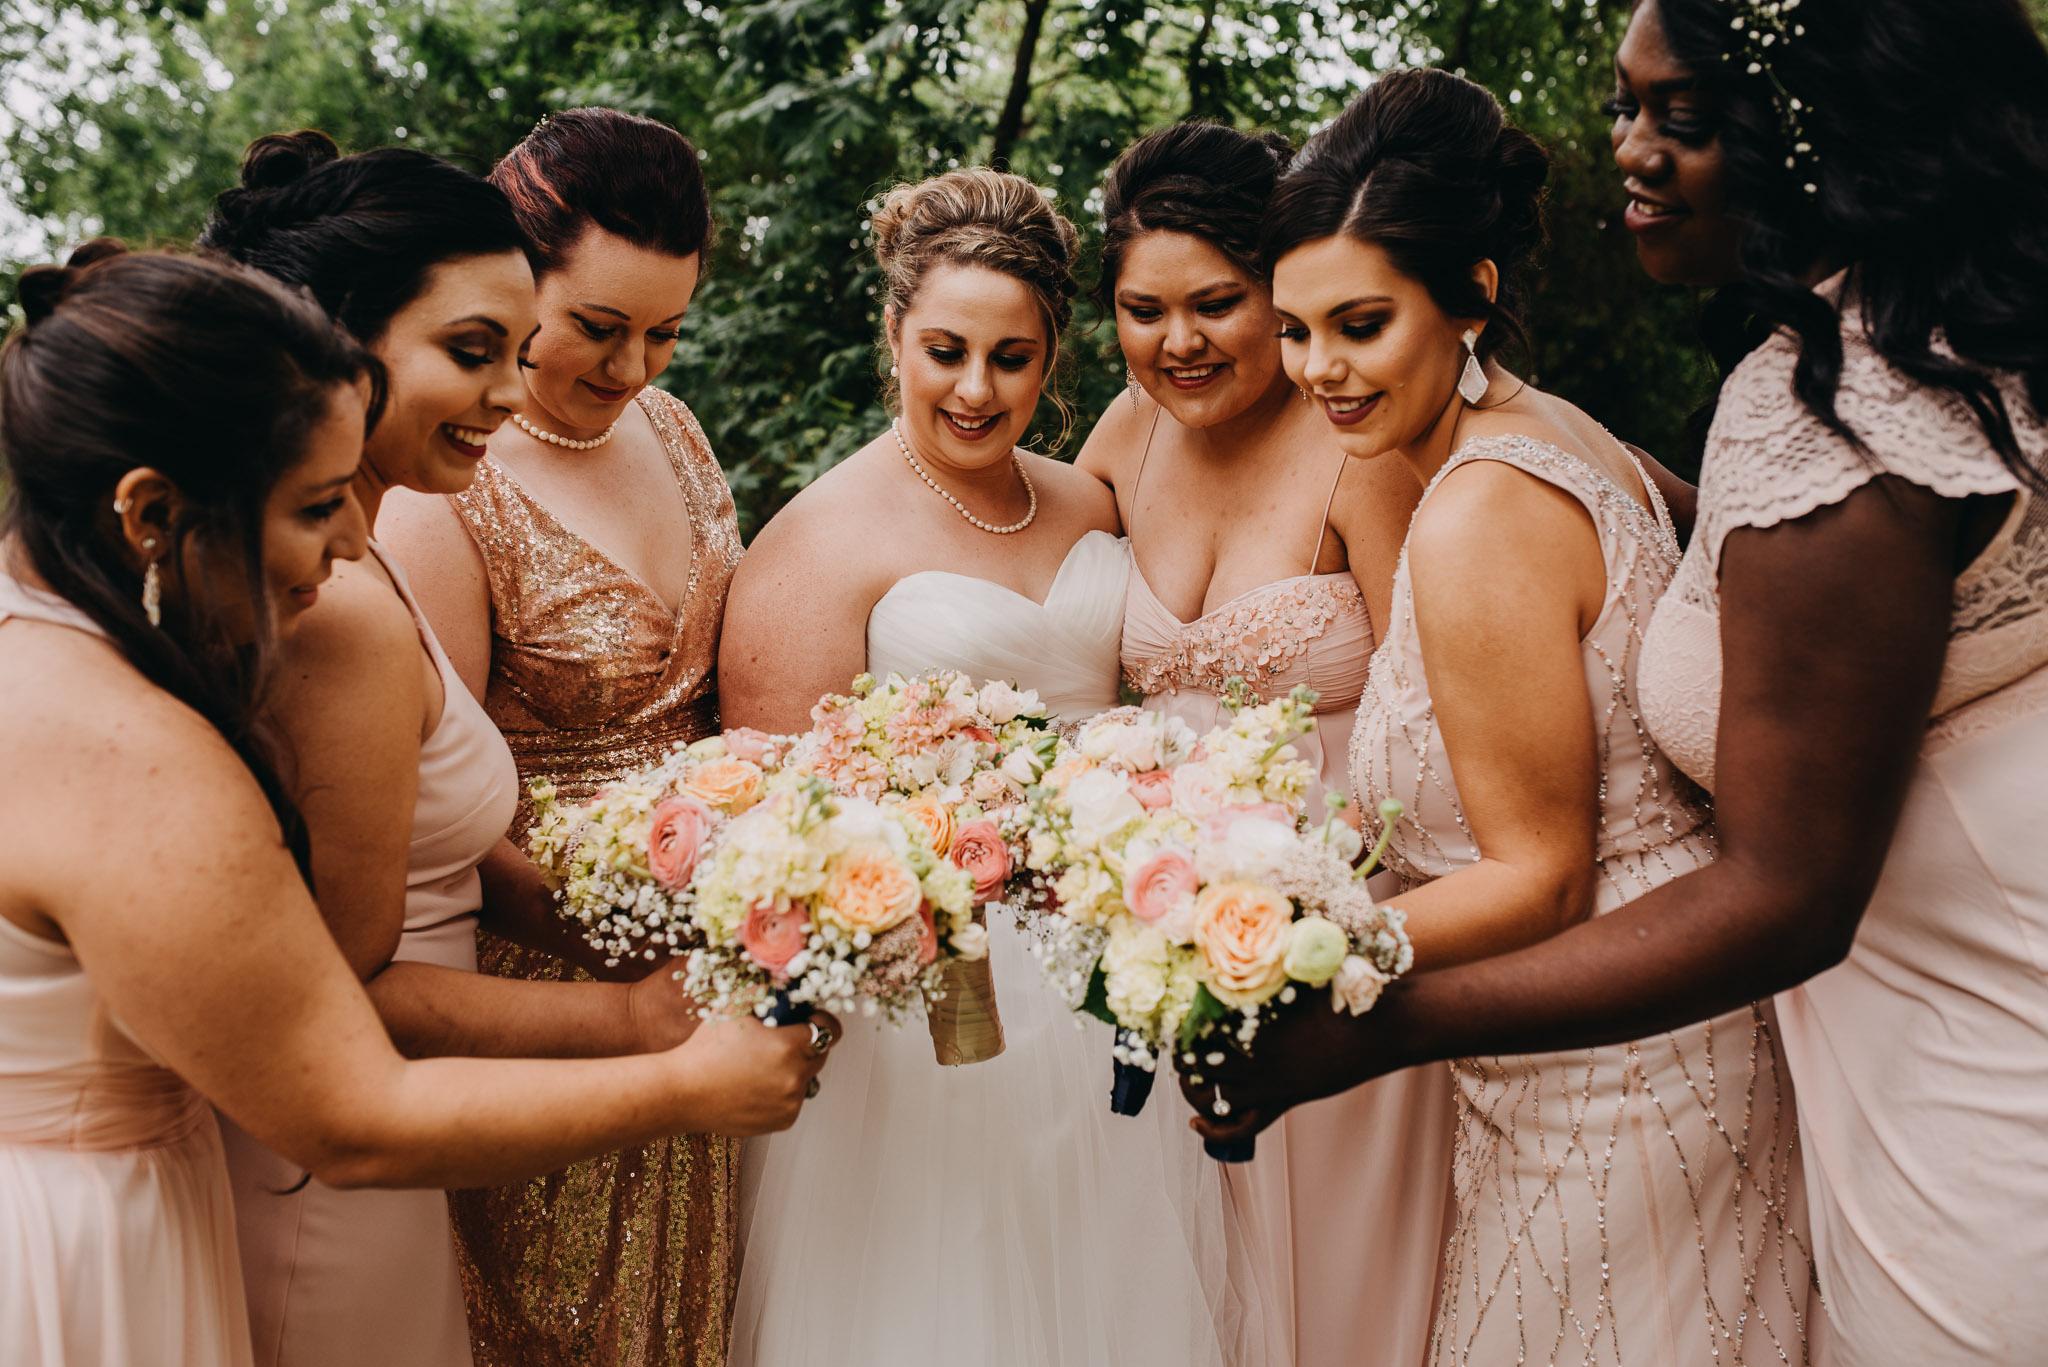 Christoval-Texas-Wedding_Photographer-Meghan&Tony-0008.jpg